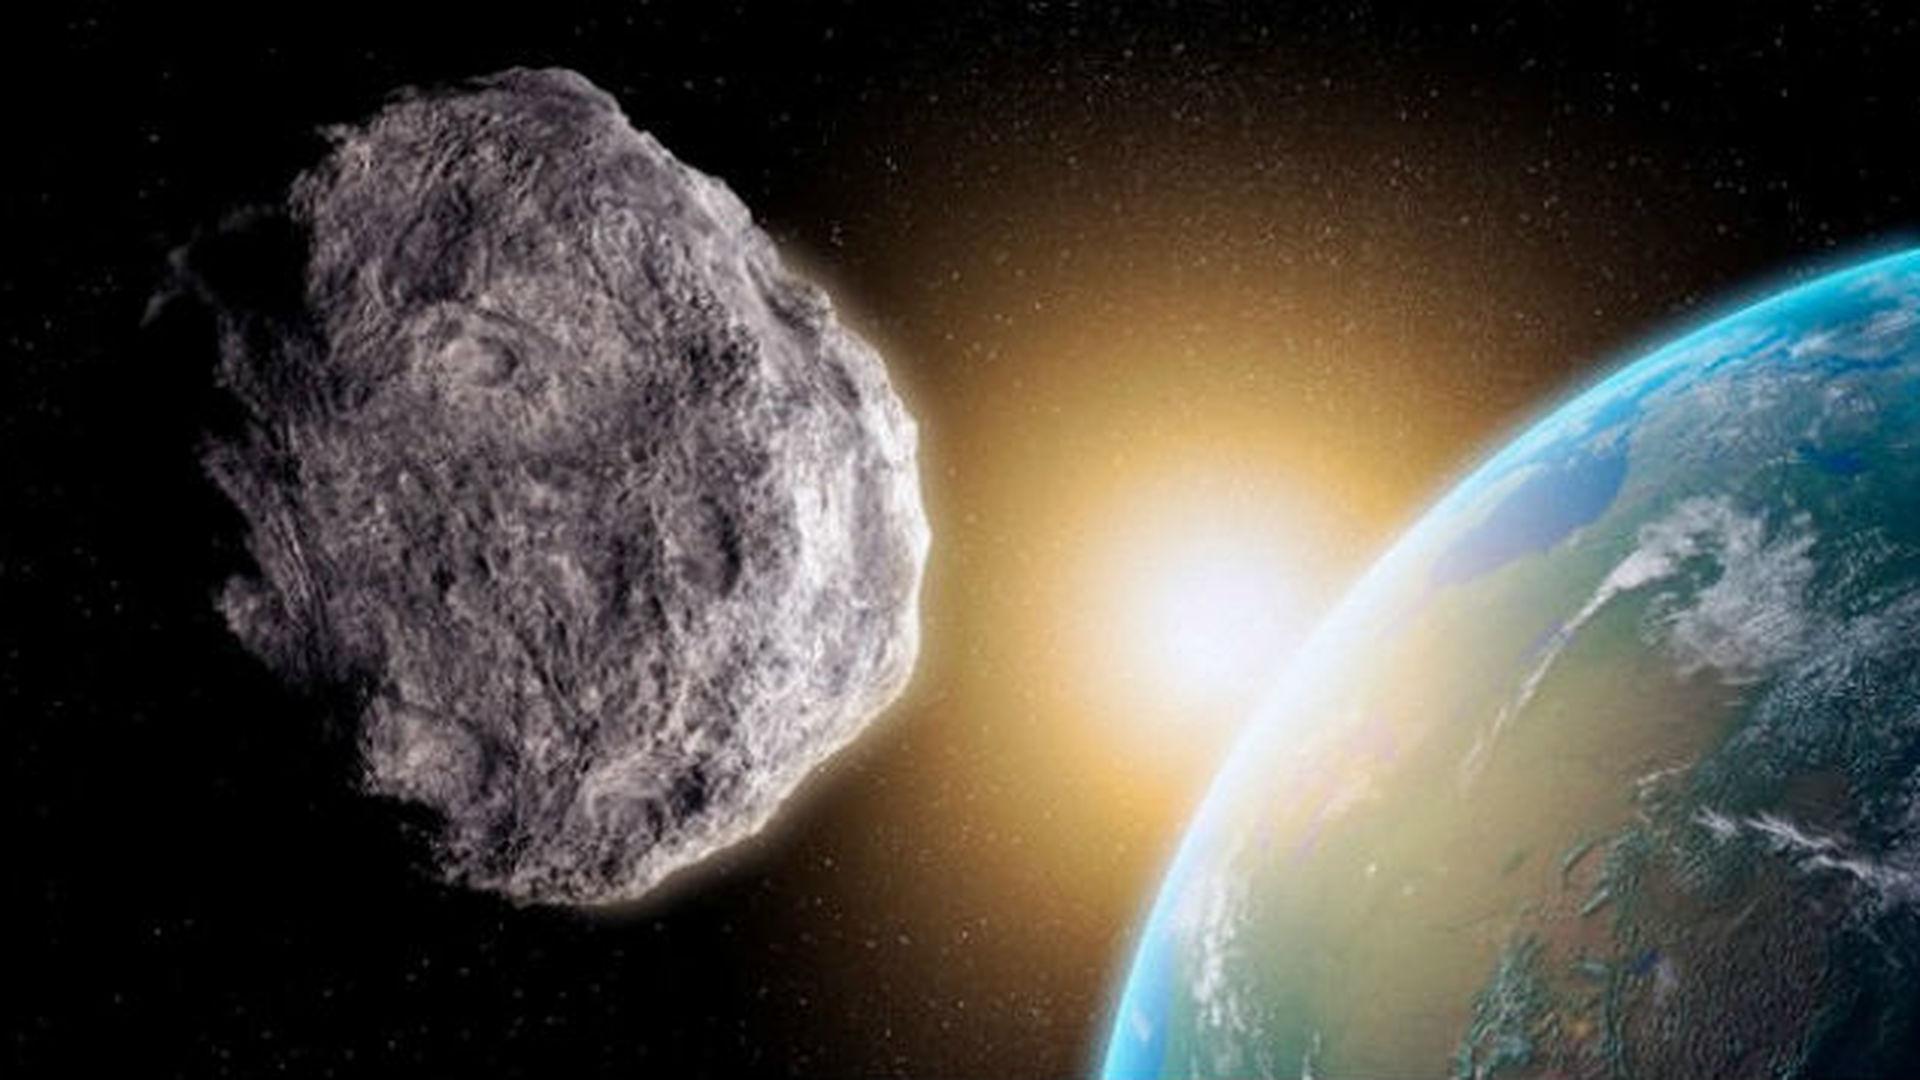 asteroid near earth 2019 - HD1252×781